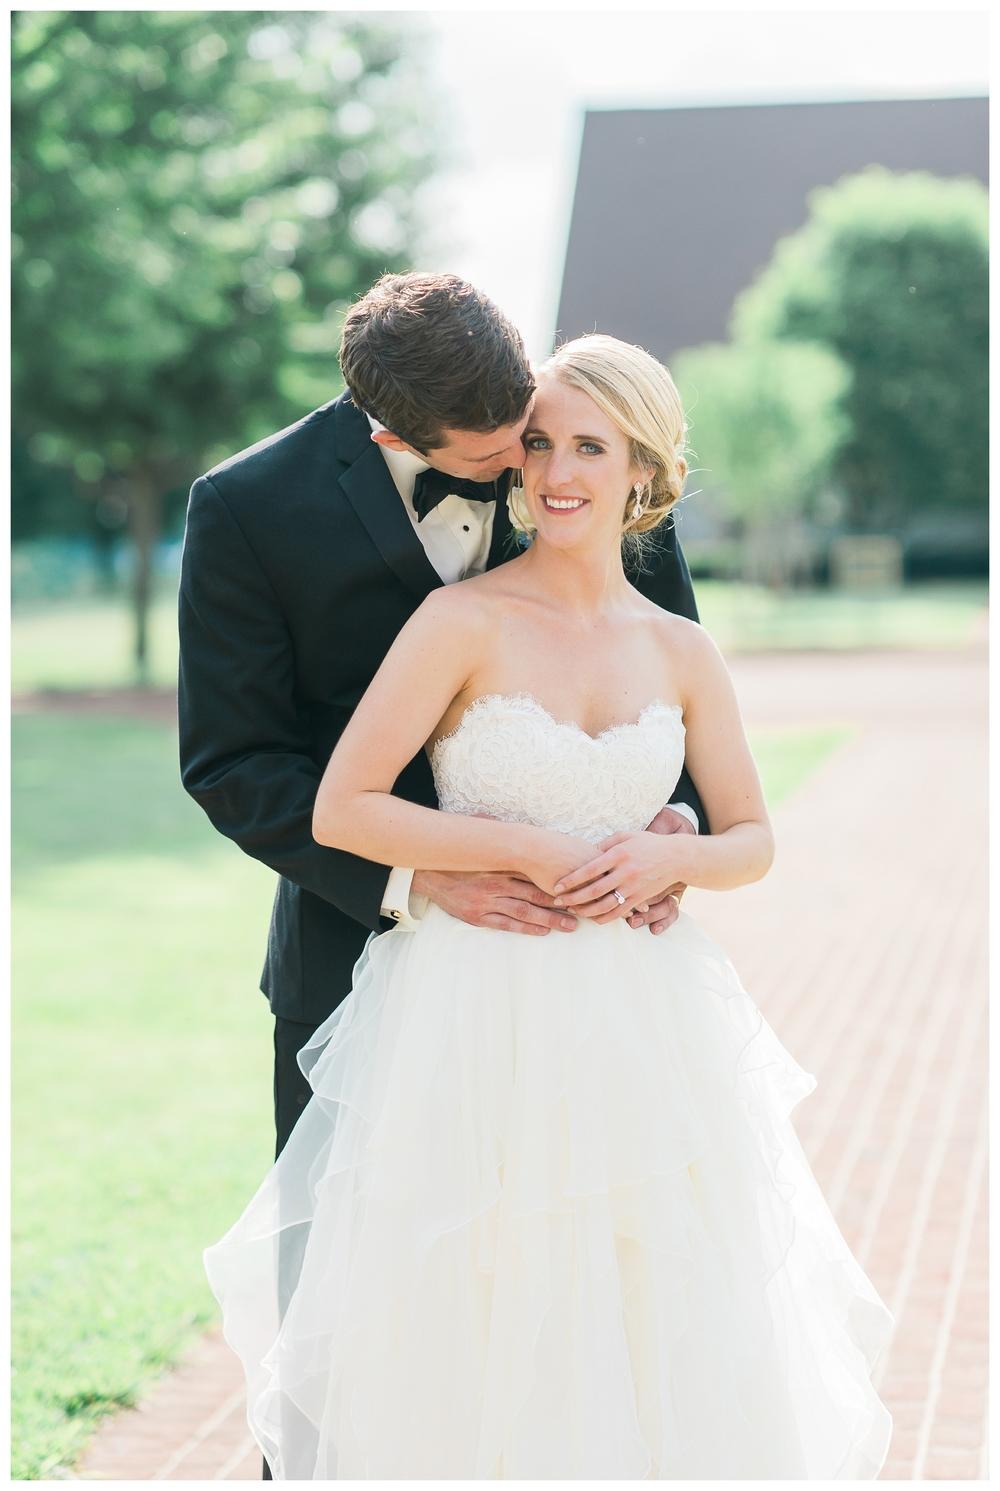 Rebecca_Bridges_Photography_Indianapolis_Wedding_Photographer_4599.jpg